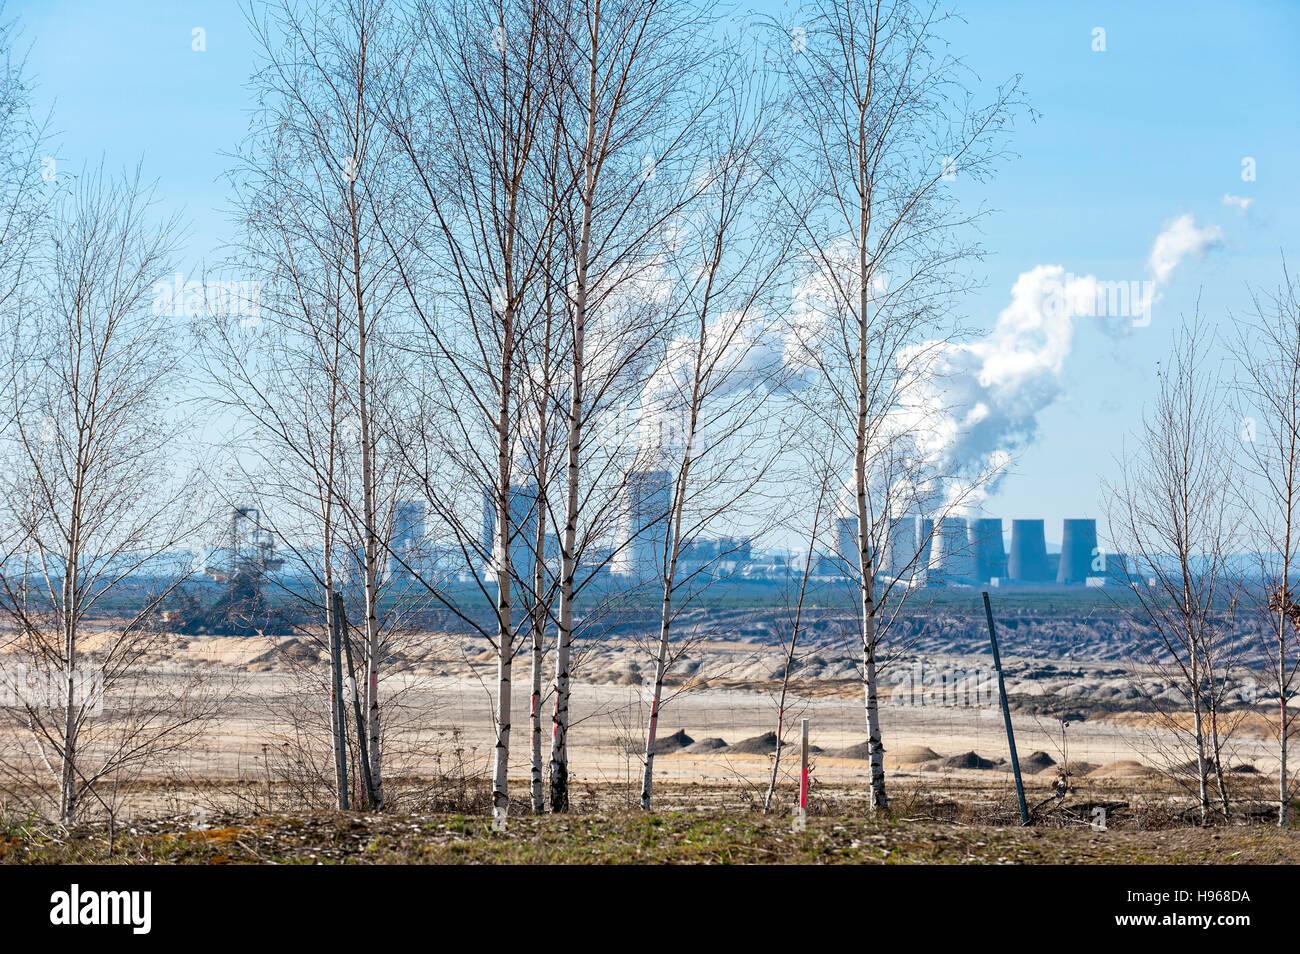 Nochten open-cast coal mine and Boxberg power plant, Görlitz district, Saxony, Germany, Europe Stock Photo